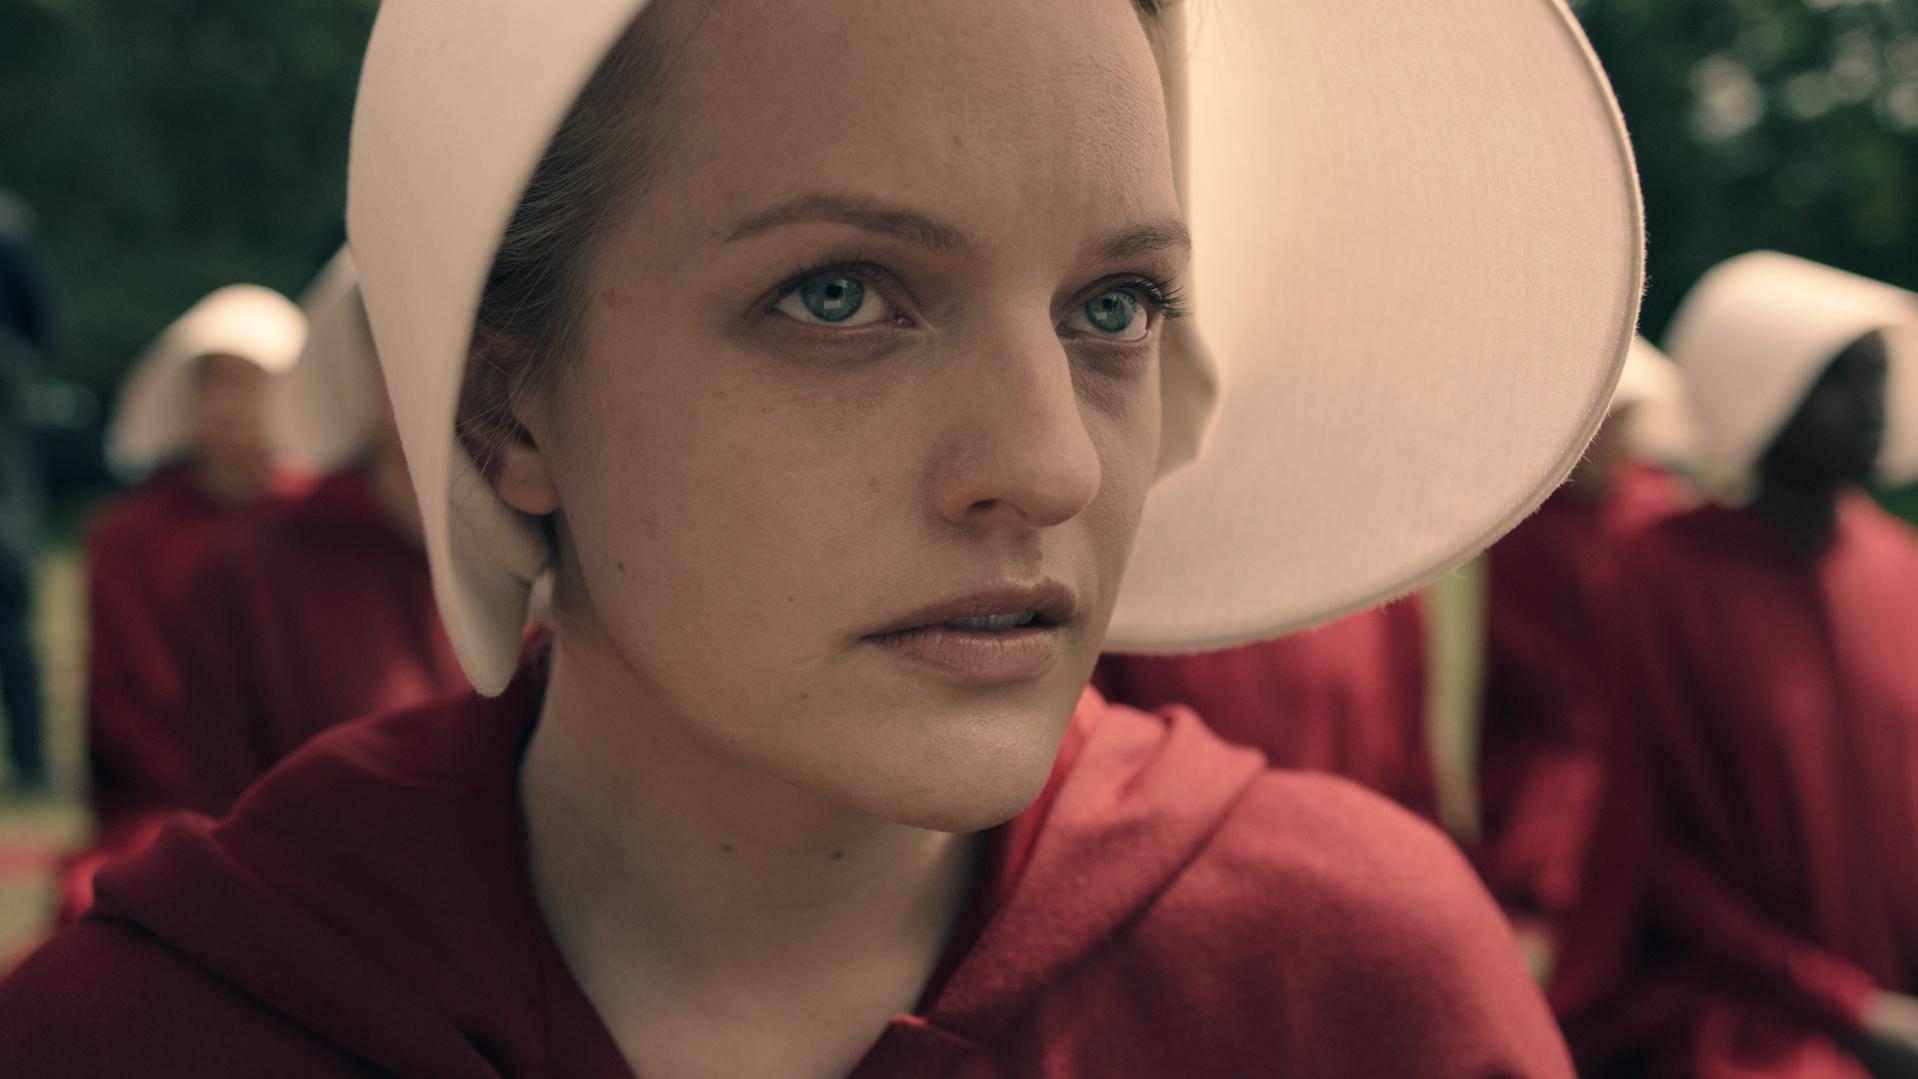 'Handmaid's Tale' Season 2 Ending Explained